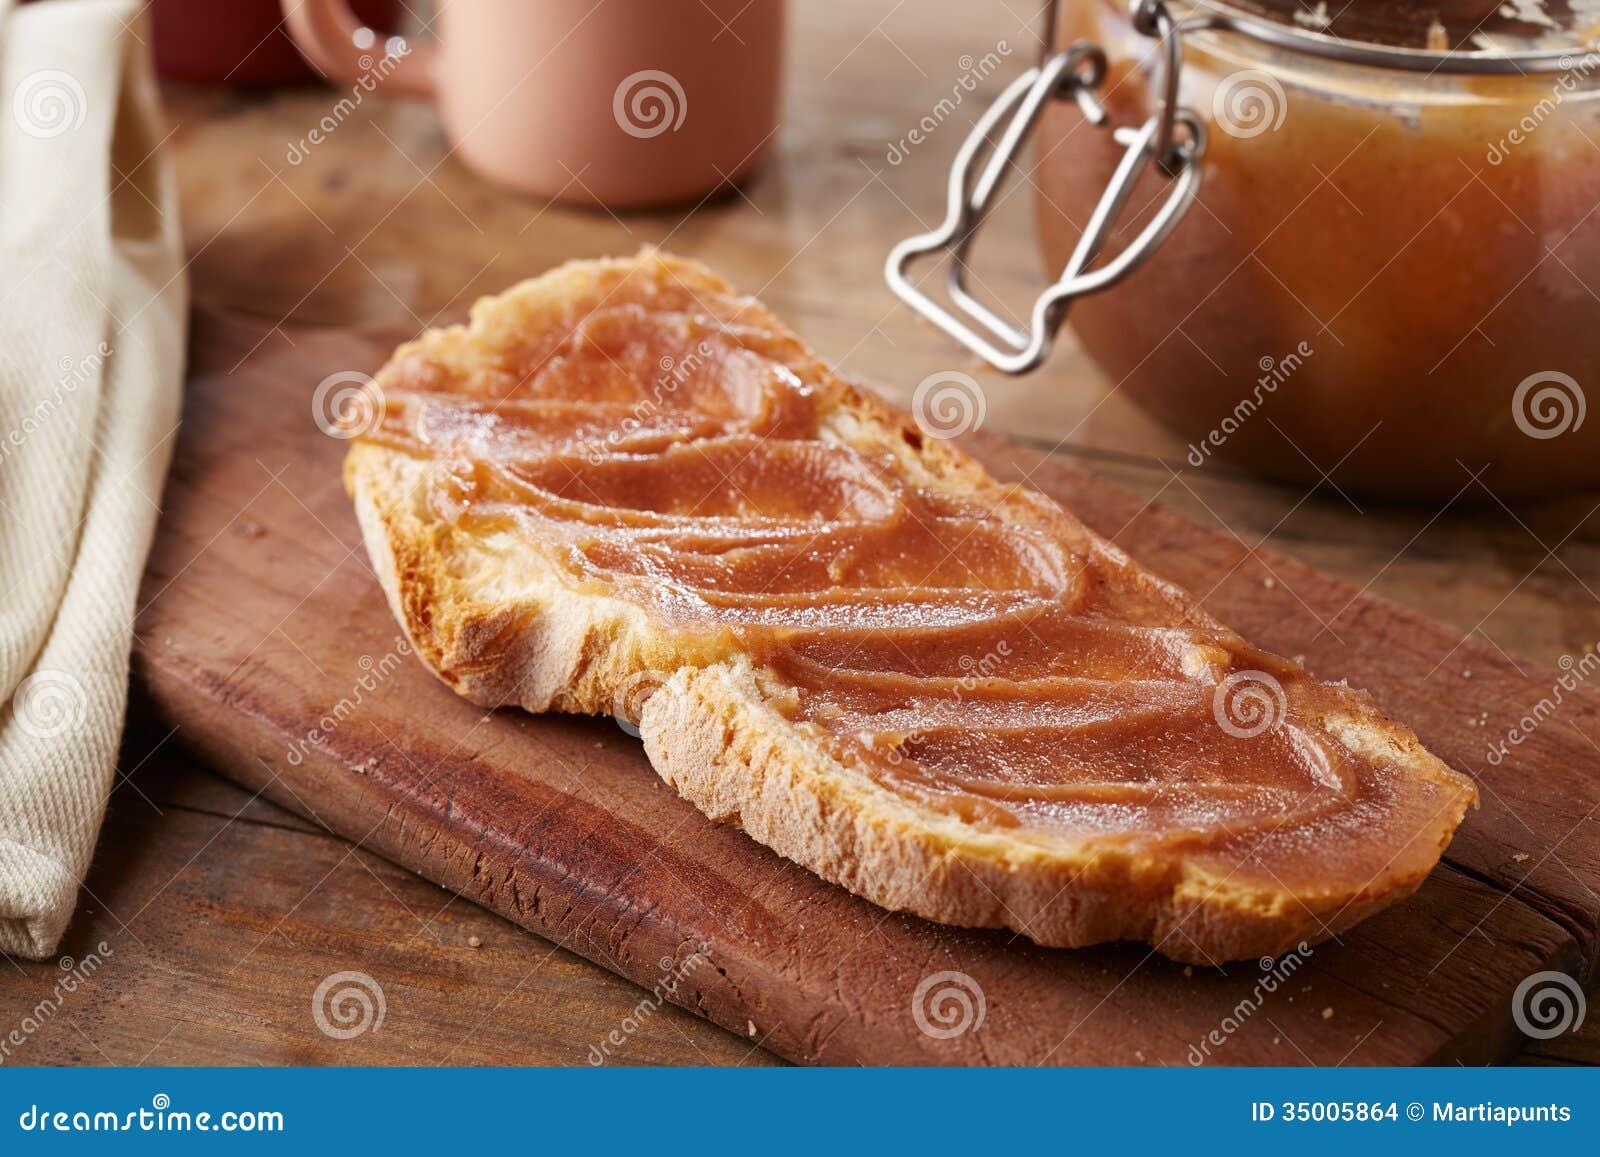 toast with creme de marrons stock images image 35005864. Black Bedroom Furniture Sets. Home Design Ideas